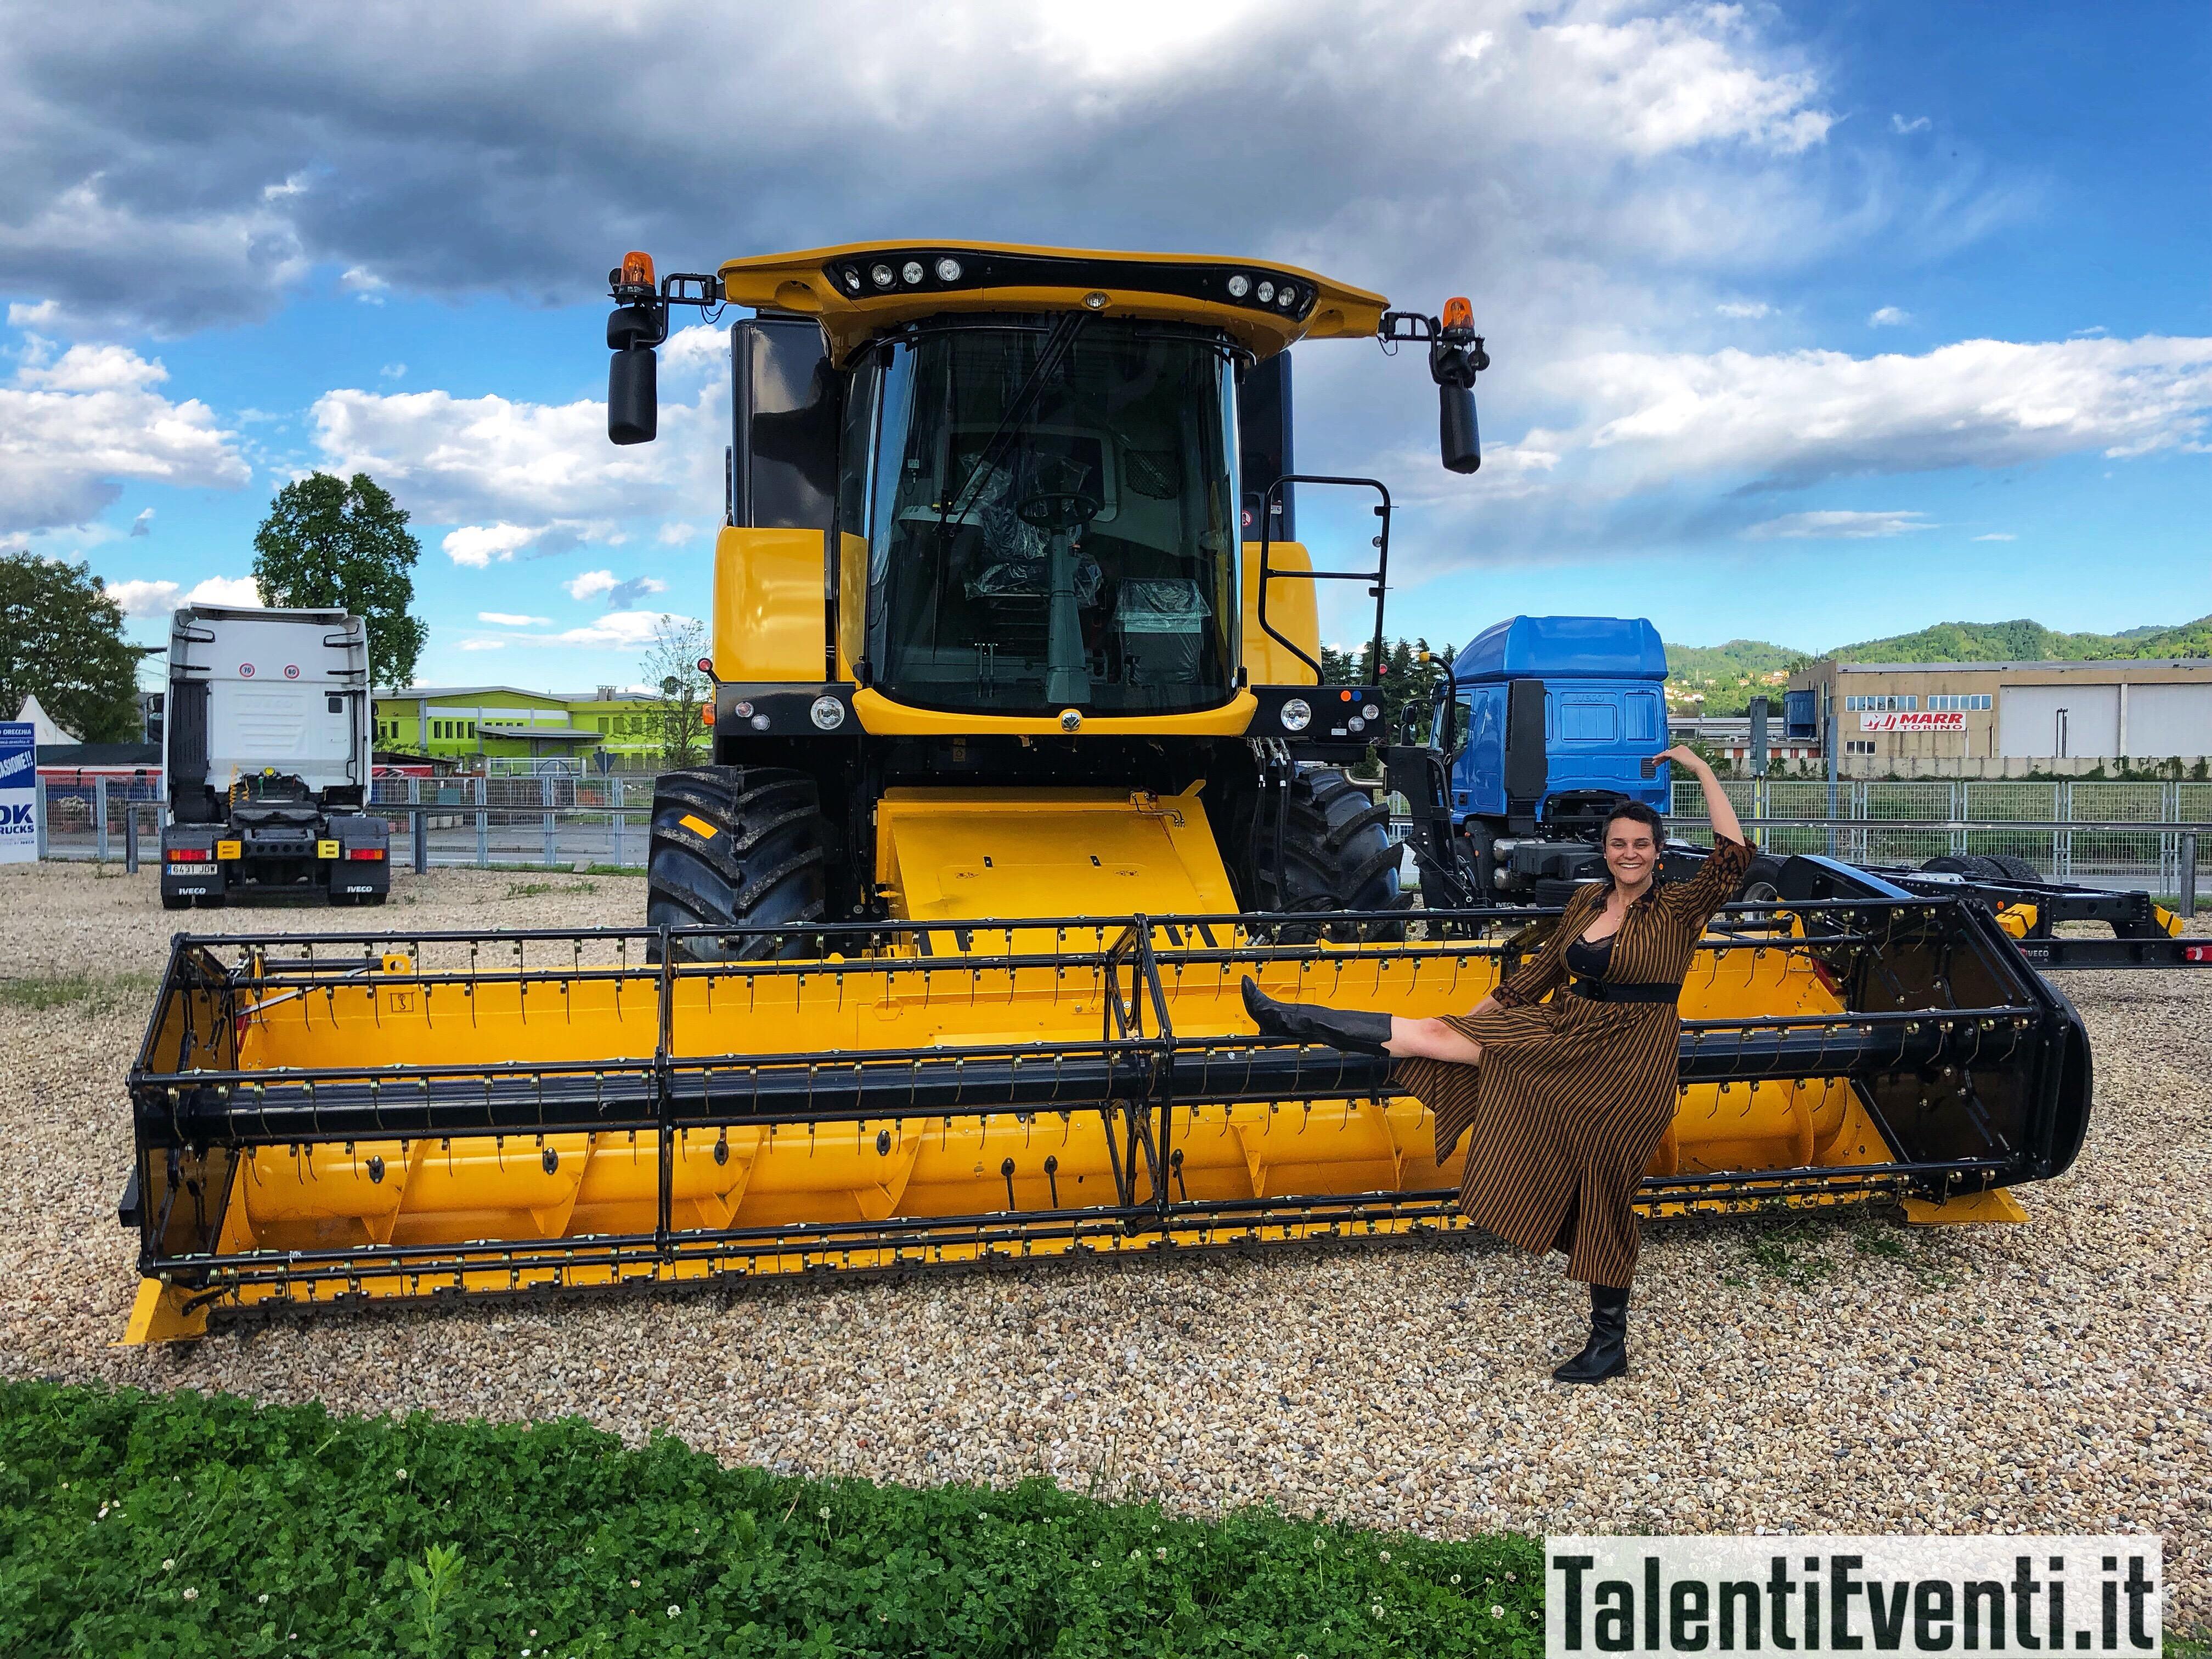 talenti_eventi_cnh_industrial_village_4